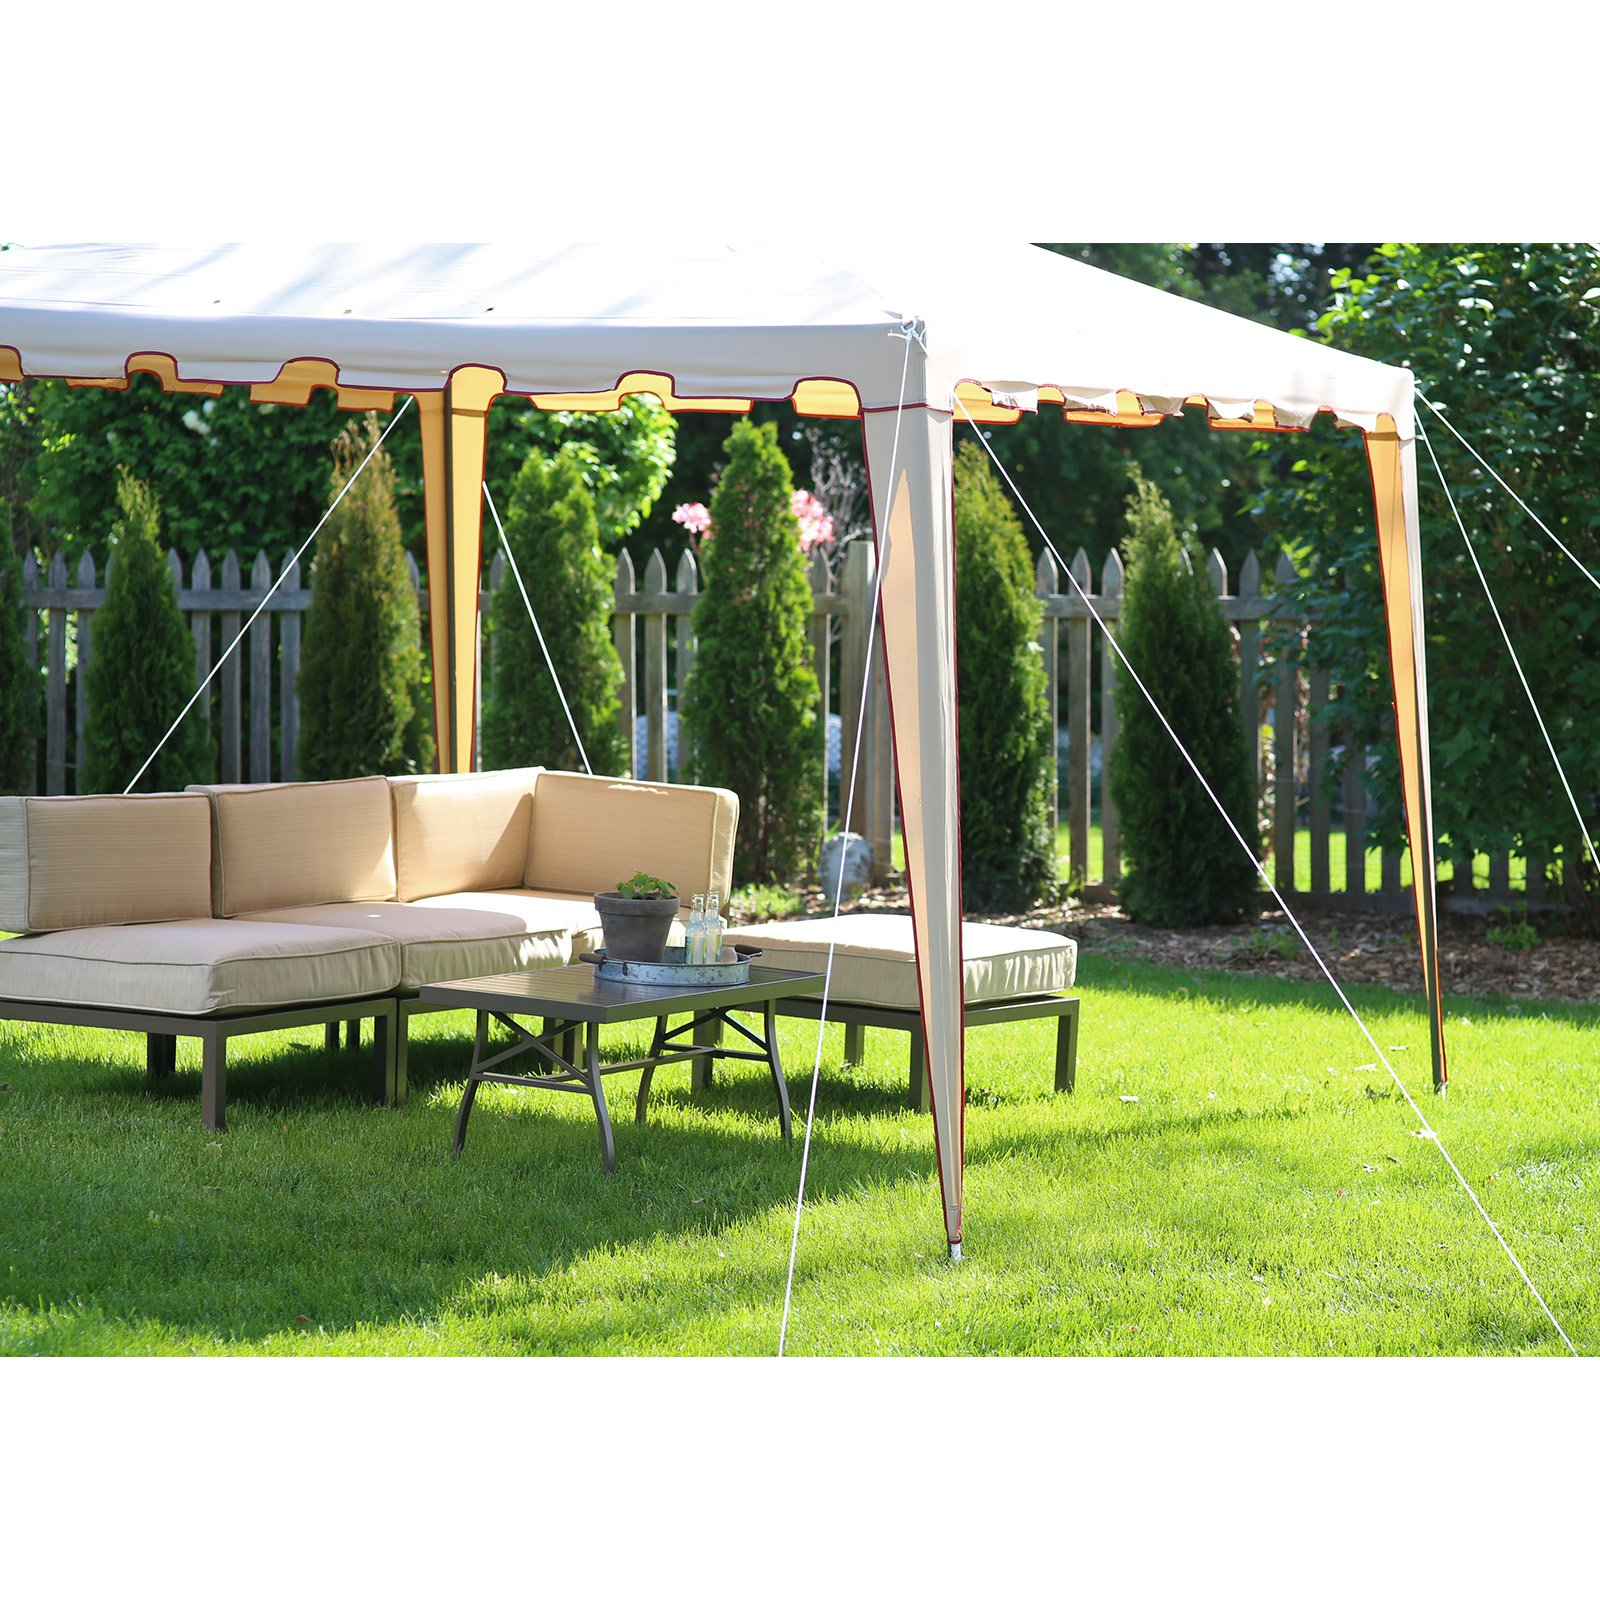 coral coast backyard festival 10 x 10 ft gazebo canopy walmart com